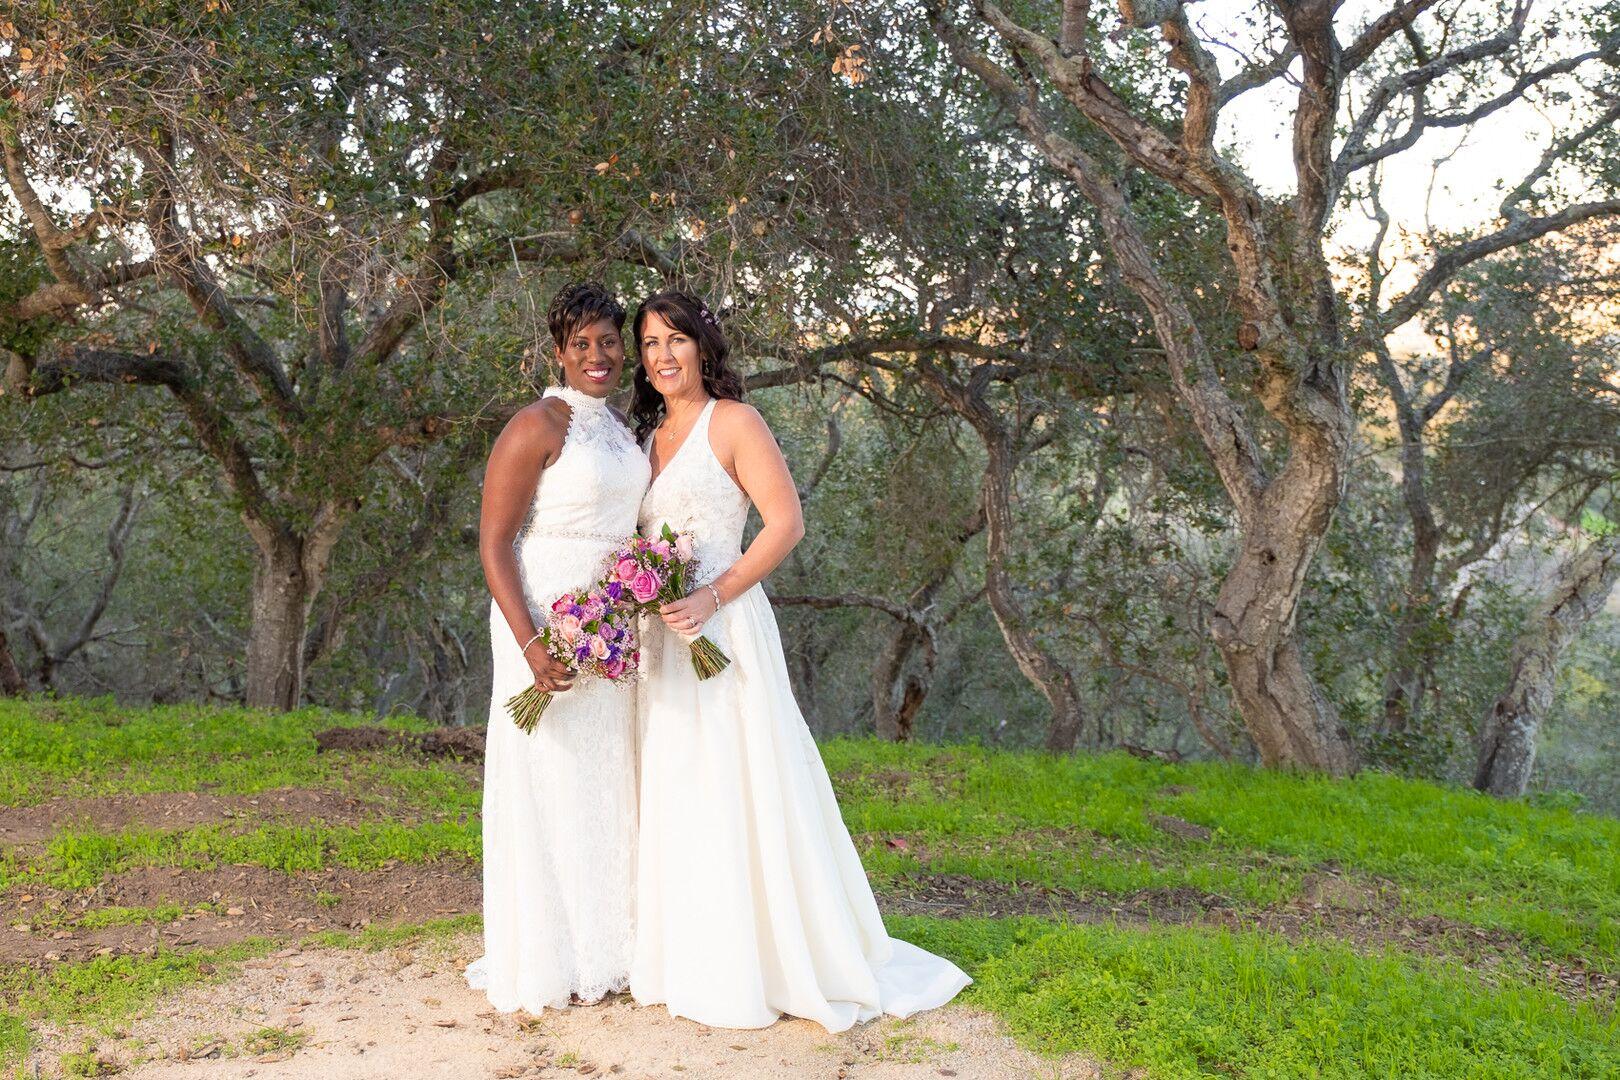 www.santabarbarawedding.com | Venue: The Casitas of Arroyo Grande | Photographer: Renoda Campbell Photography | Second Shooter: John Patrick Images |  Brides Posing